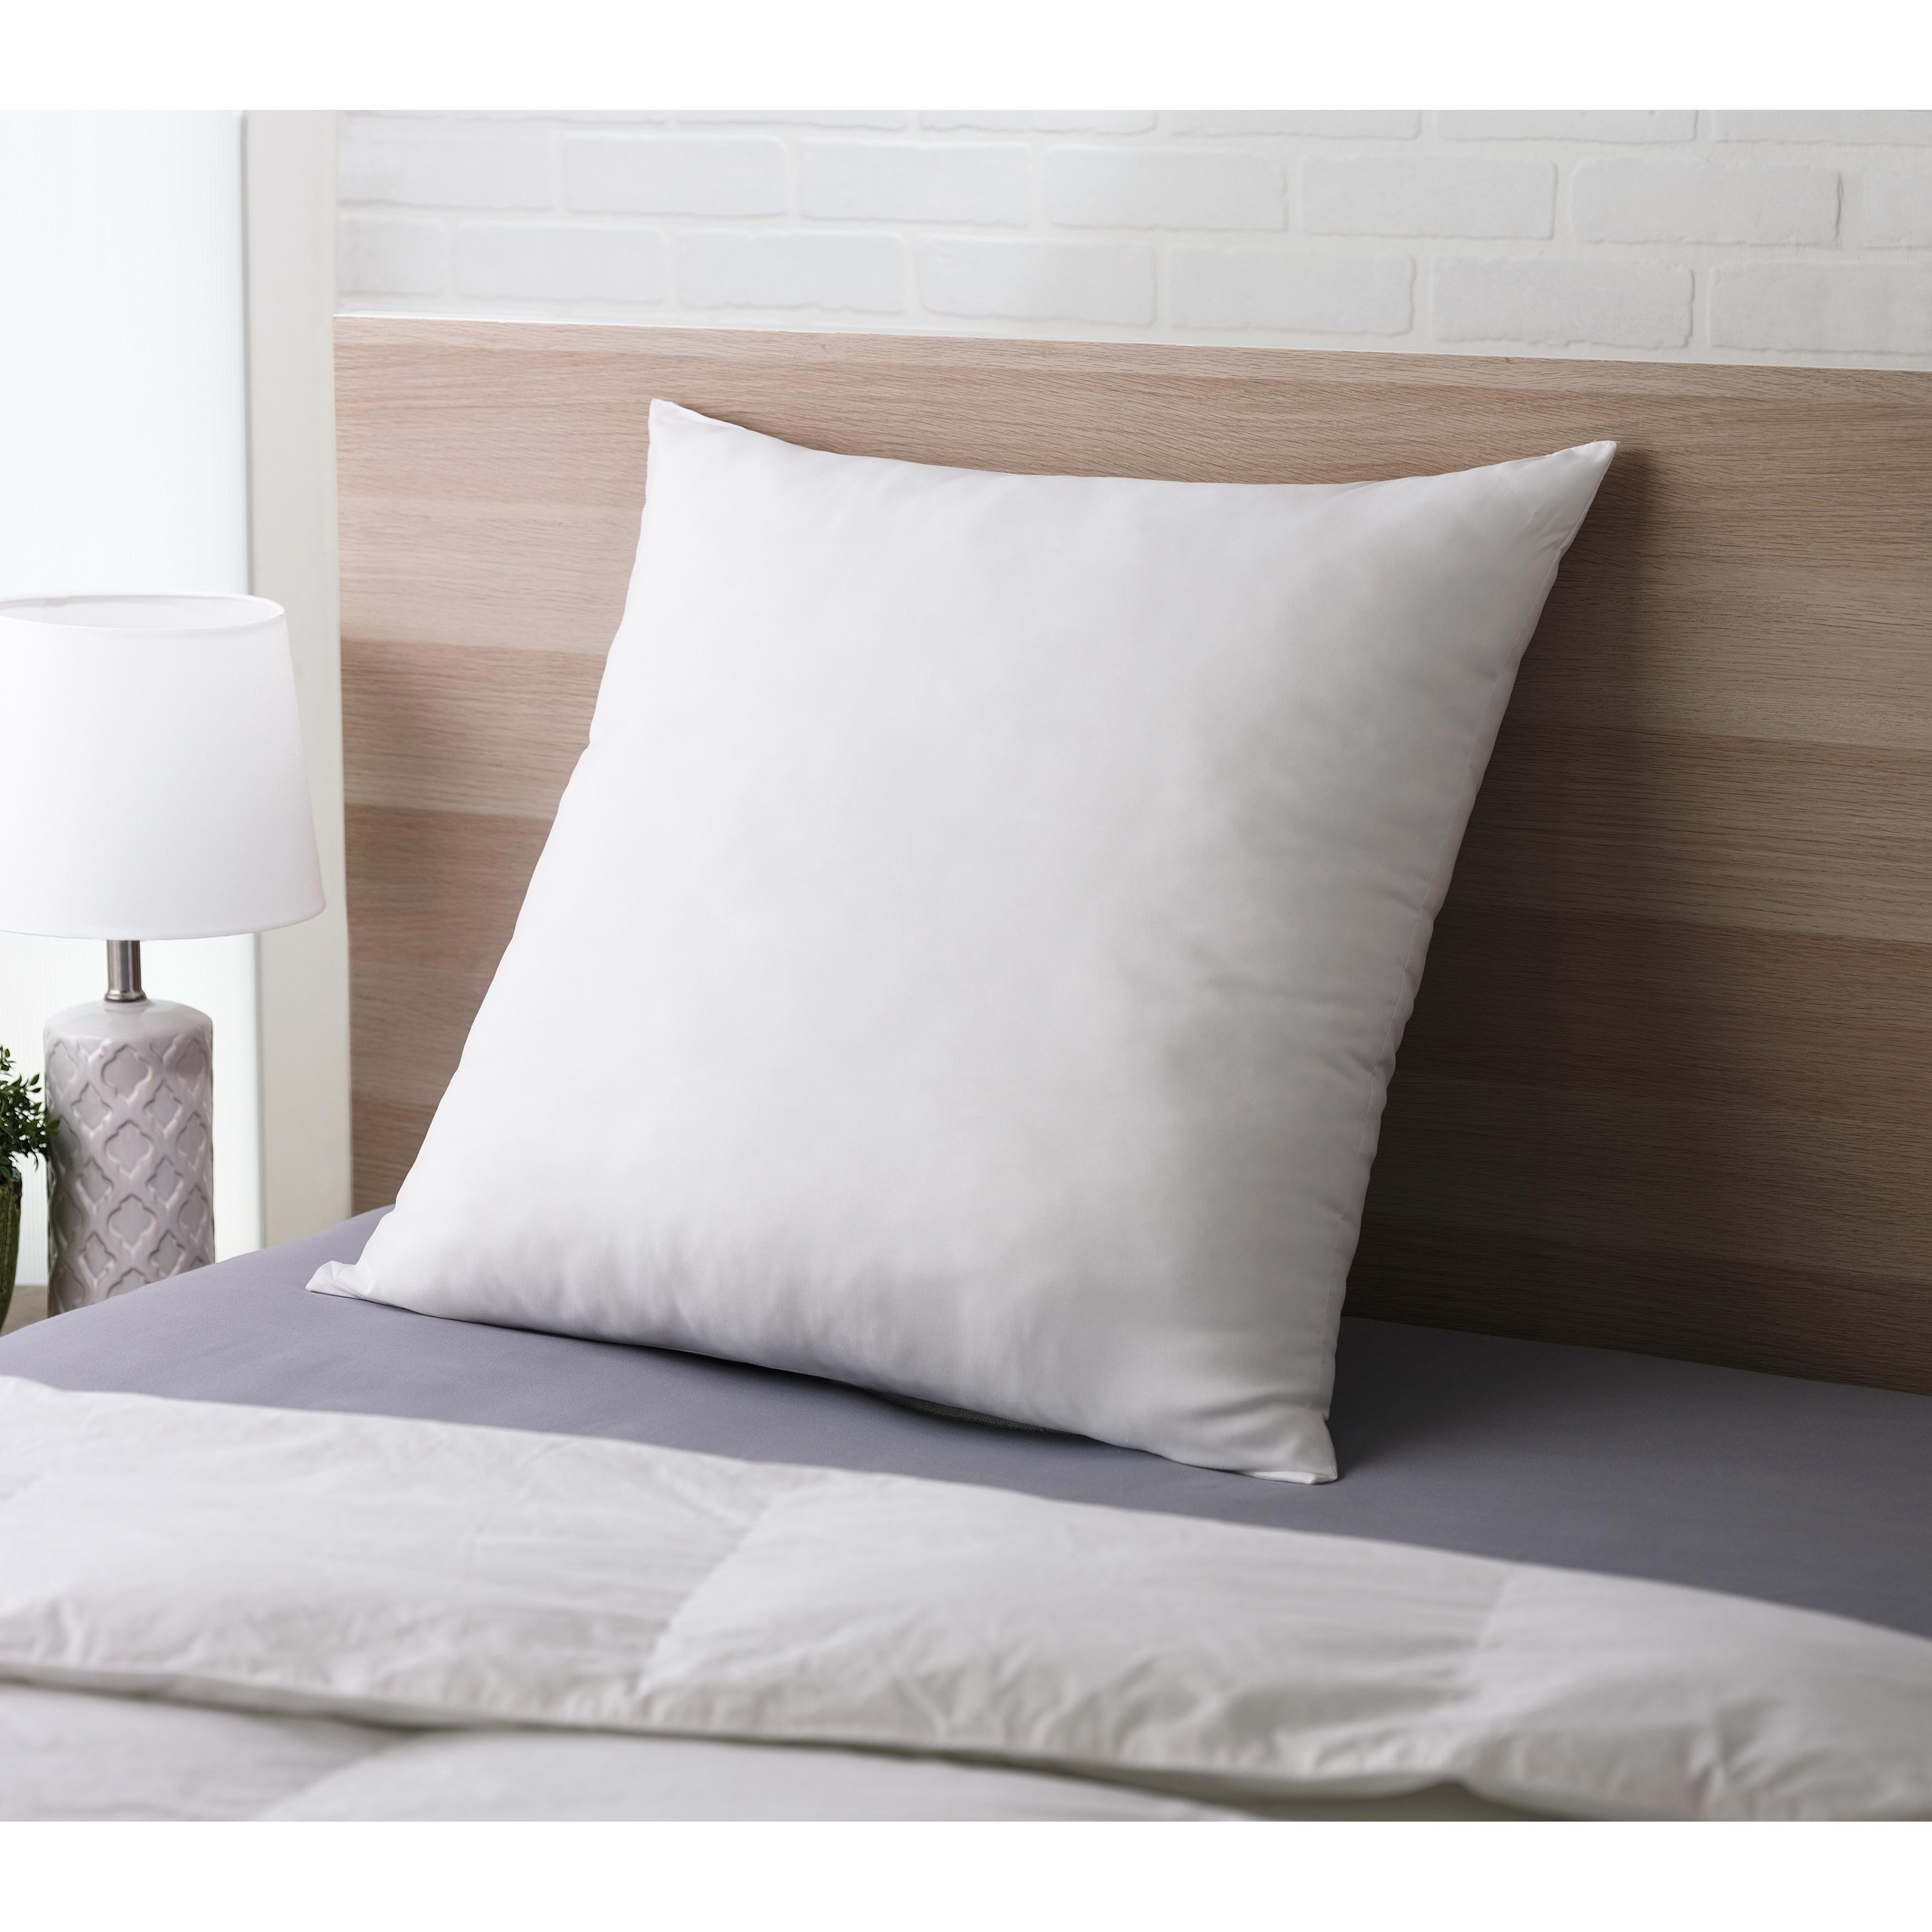 Shop Cozy Classics Big And Lofty Euro Pillow Overstock 29952248